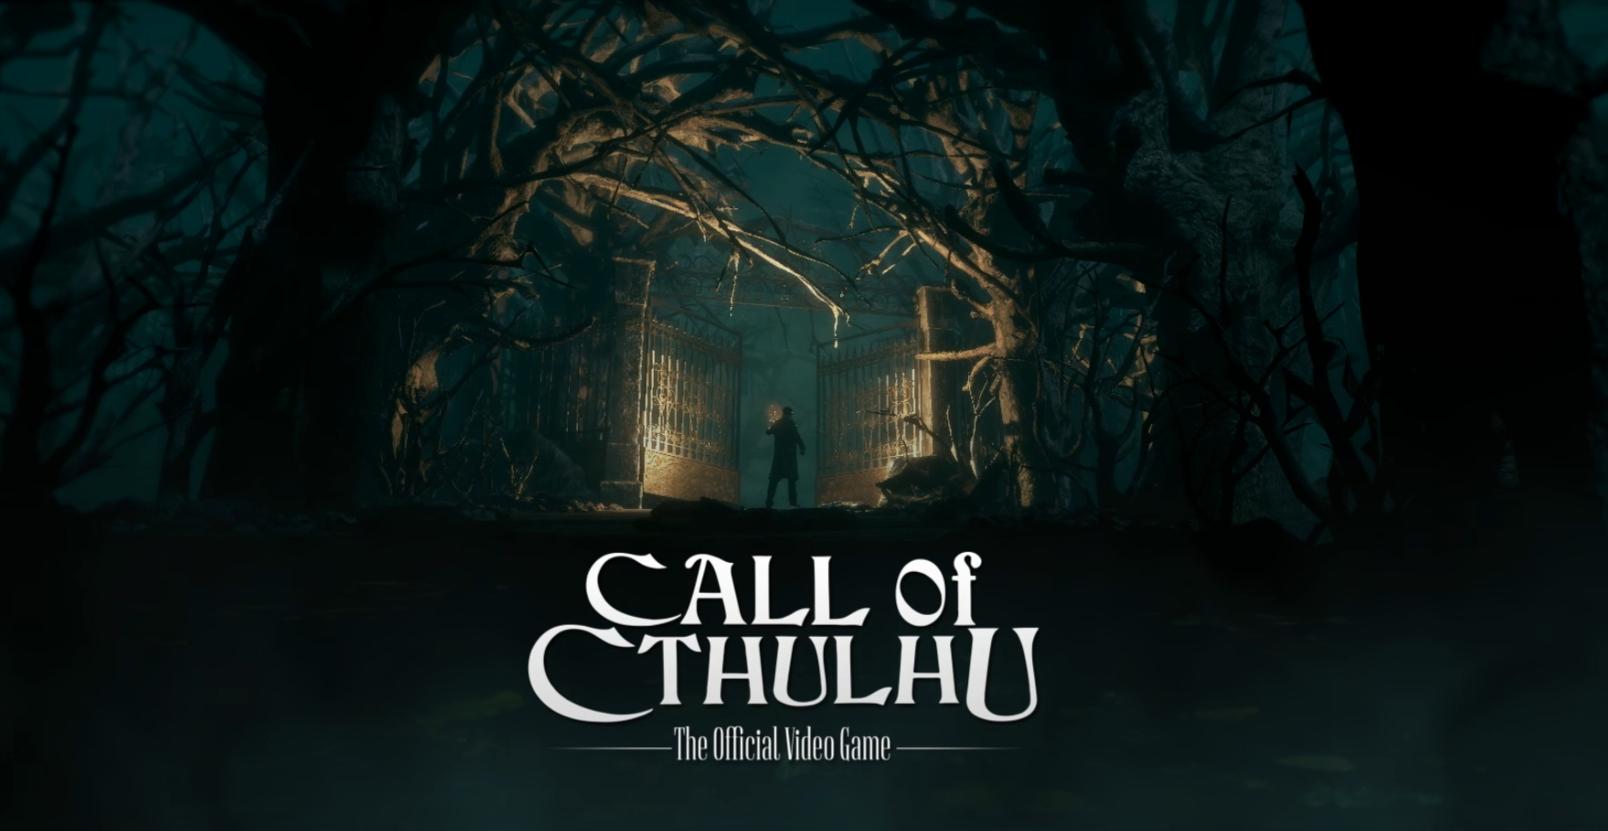 CallOfCthulhuHeader